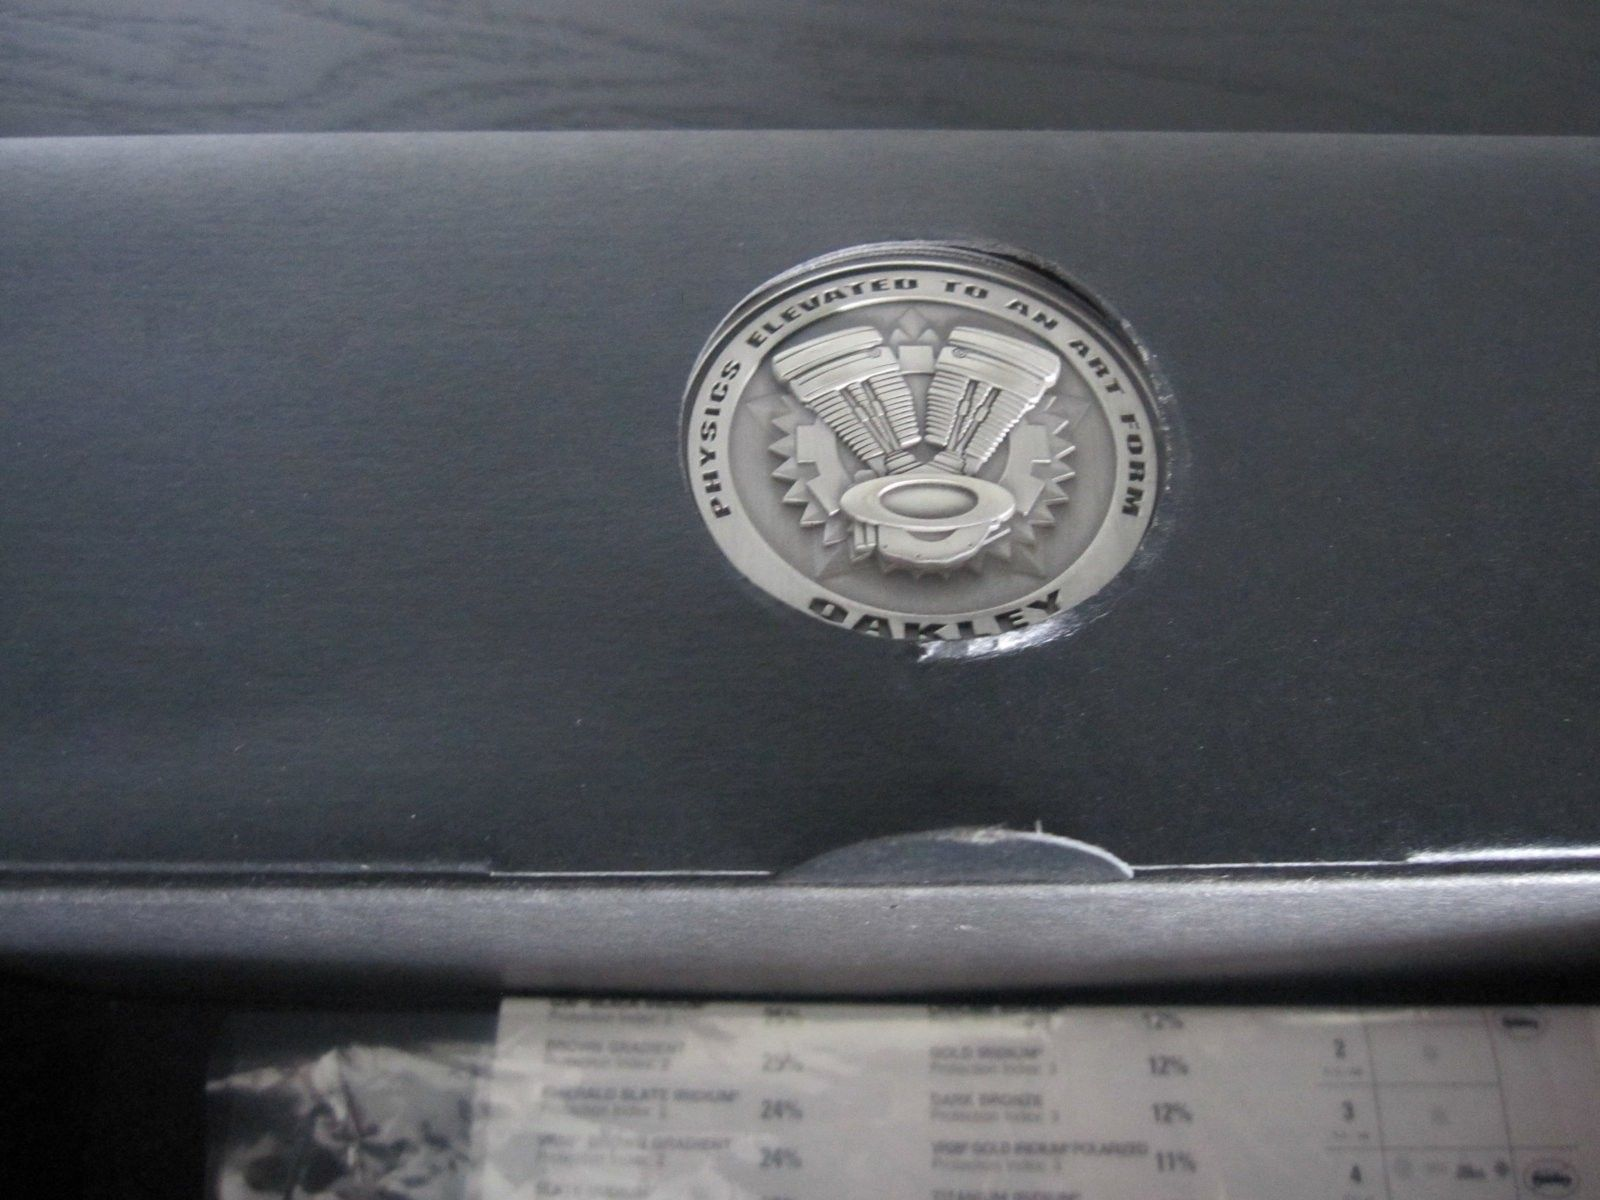 XS 6011-01 box/coin, no sunnies  GONE - IMG_5463.JPG